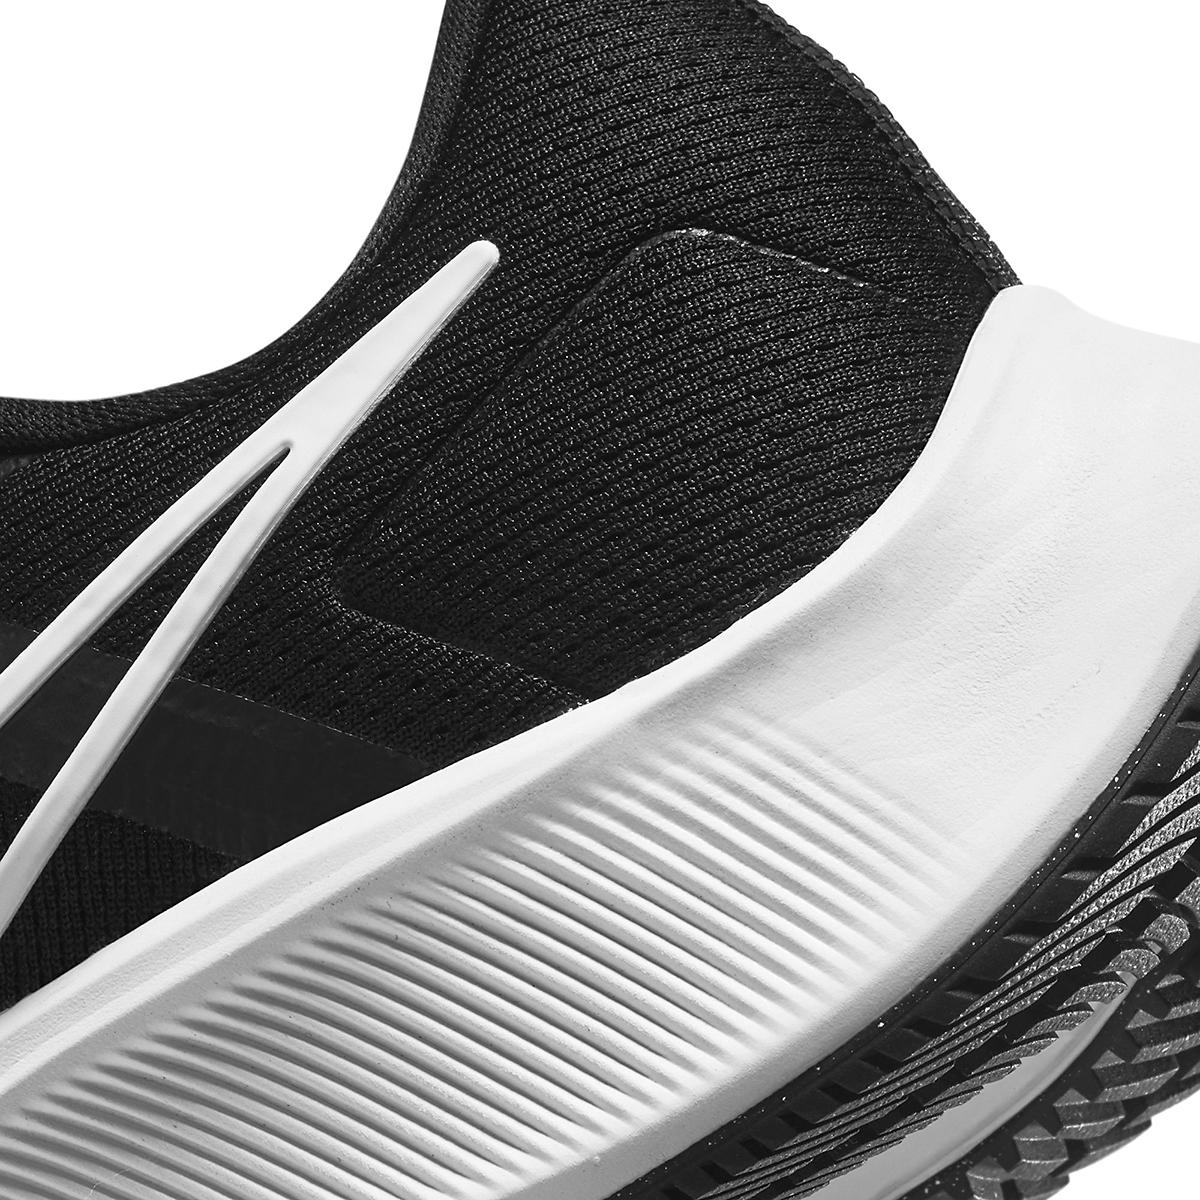 Men's Nike Air Zoom Pegasus 38 Running Shoe - Color: Black/White/Anthracite - Size: 6 - Width: Regular, Black/White/Anthracite, large, image 4